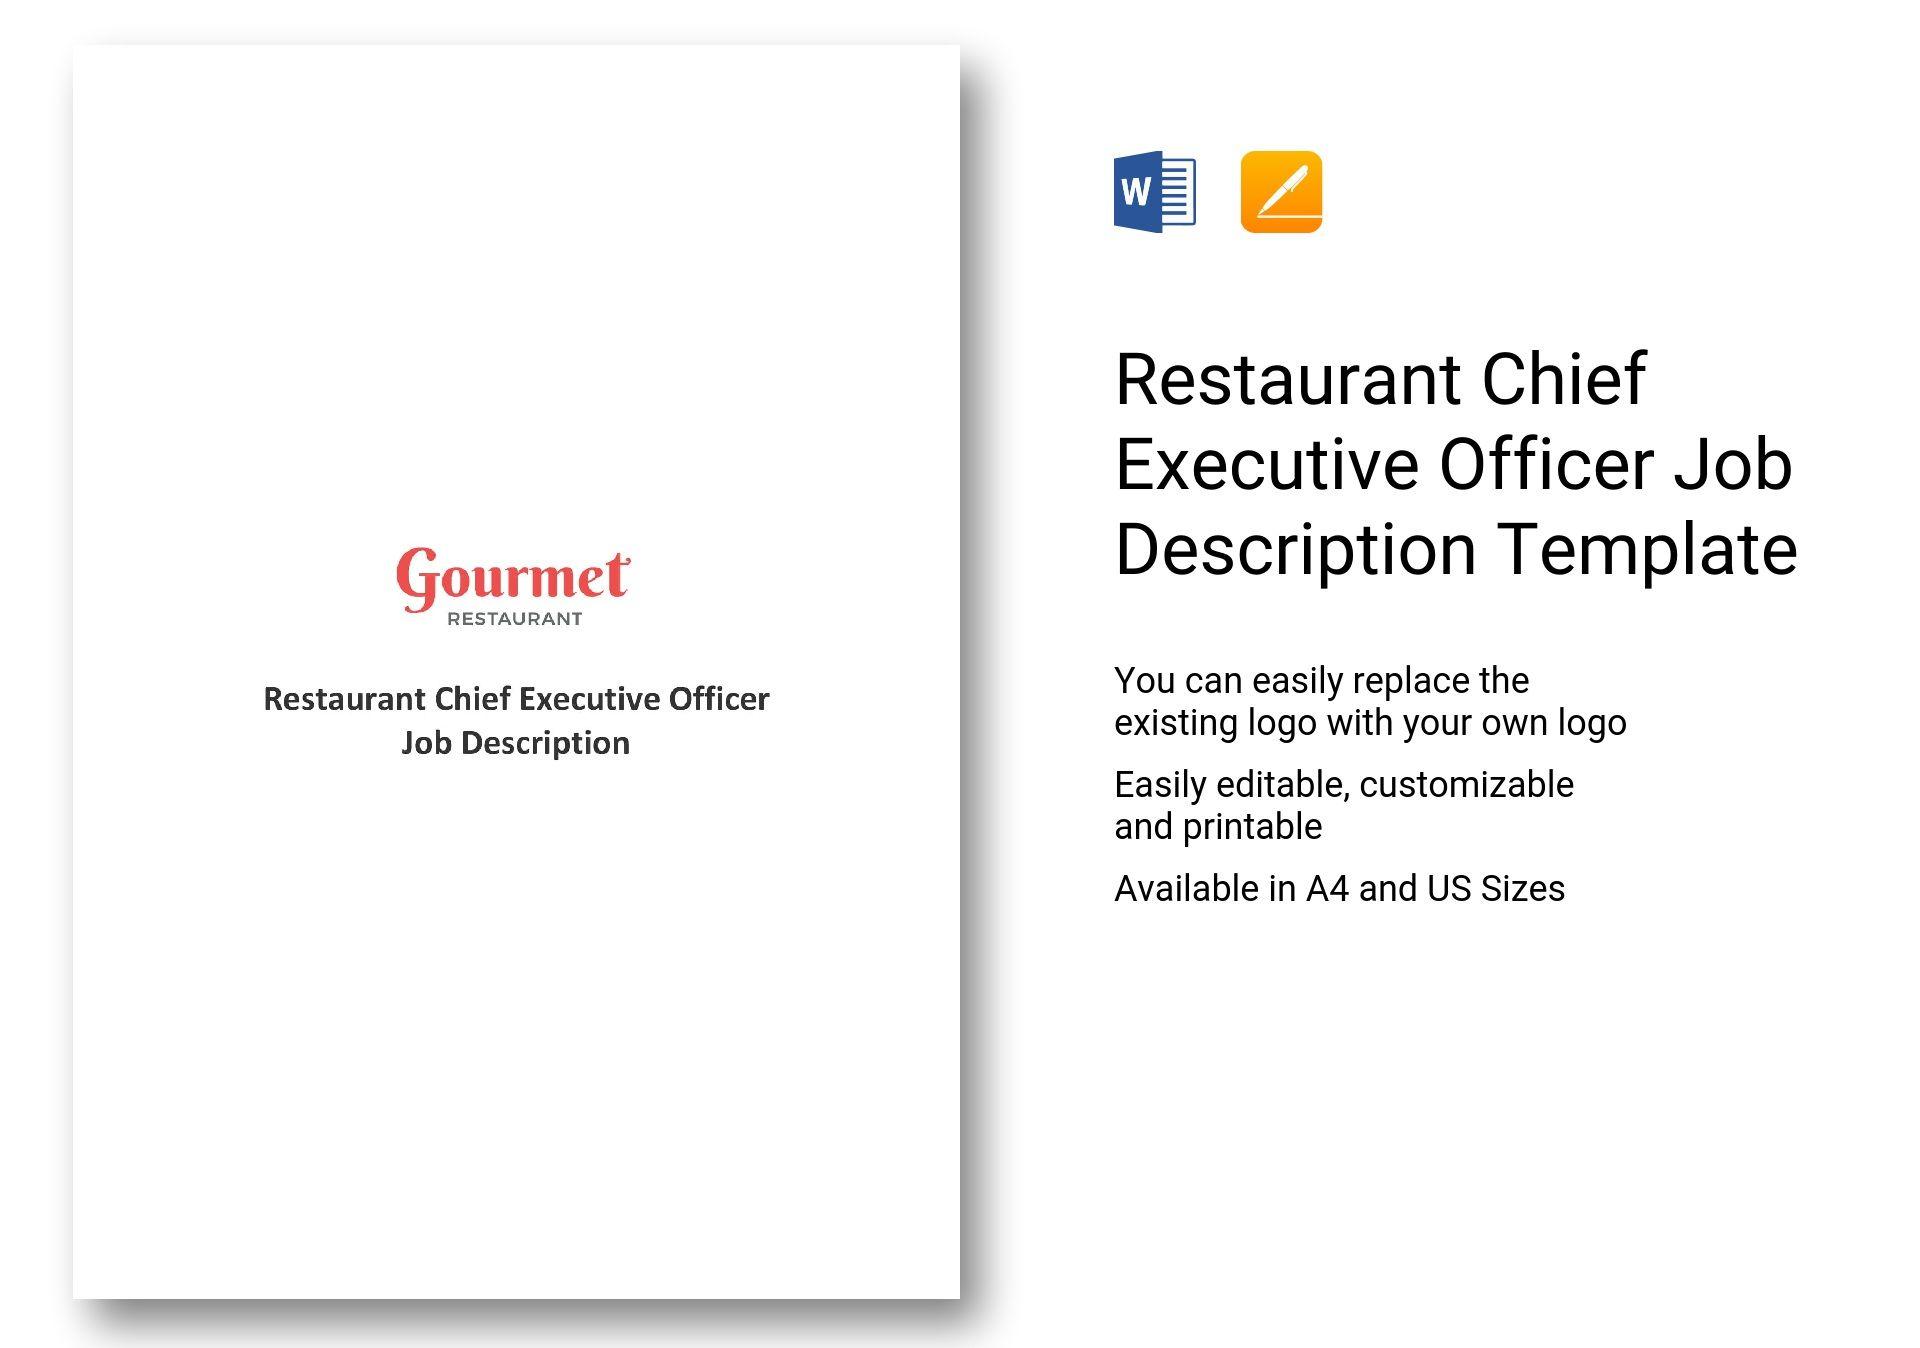 Restaurant Chief Executive Officer Job Description